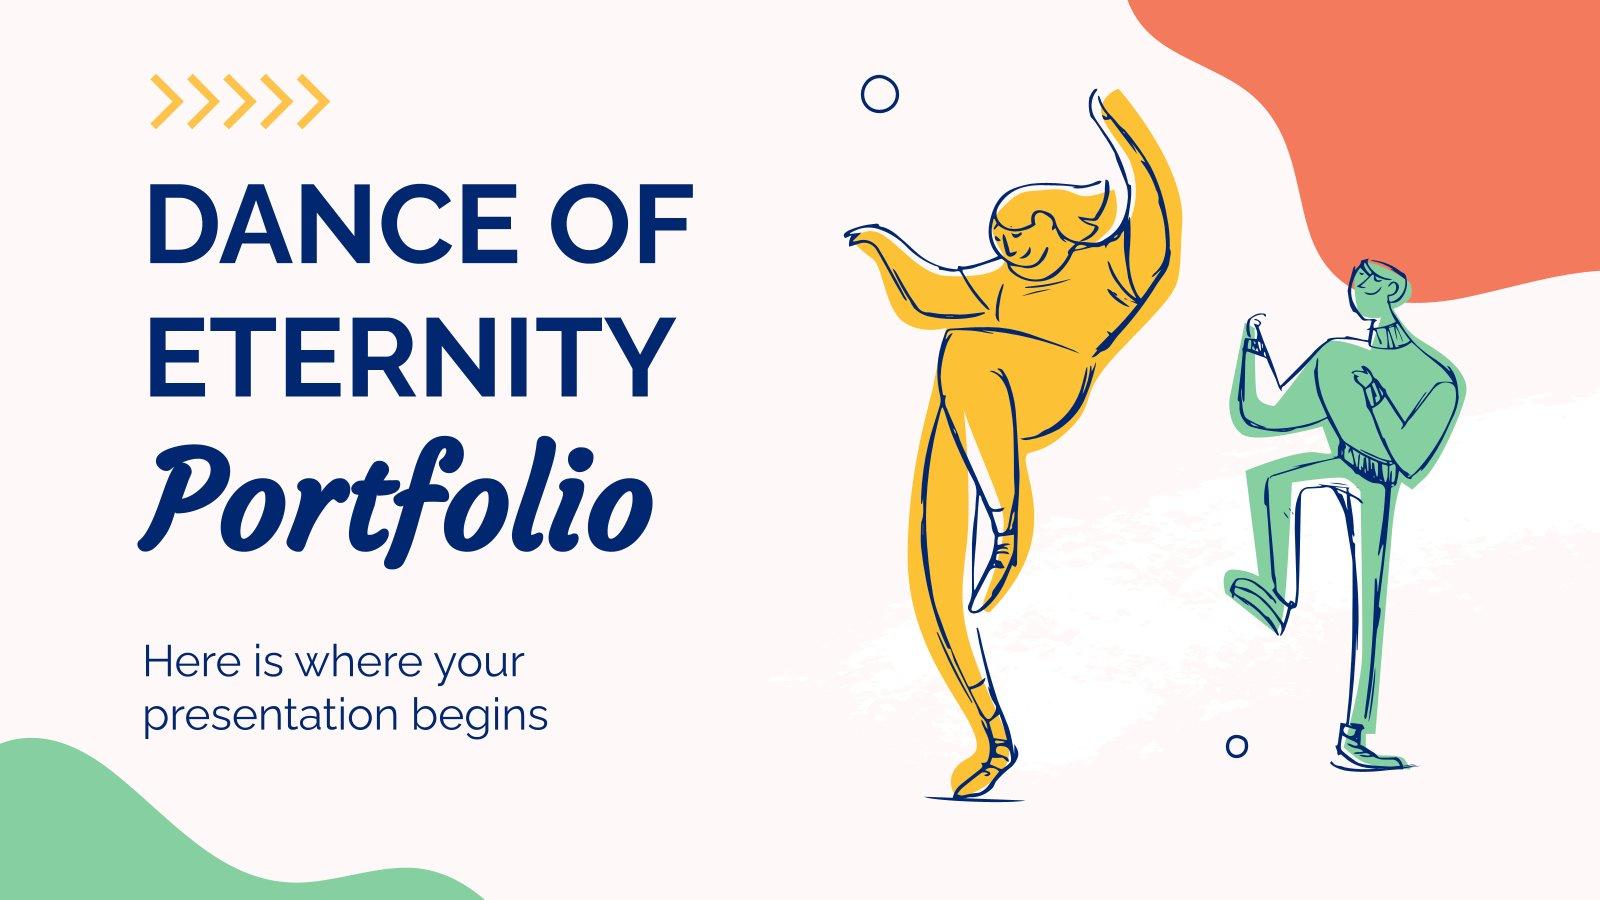 Dance of Eternity Portfolio presentation template